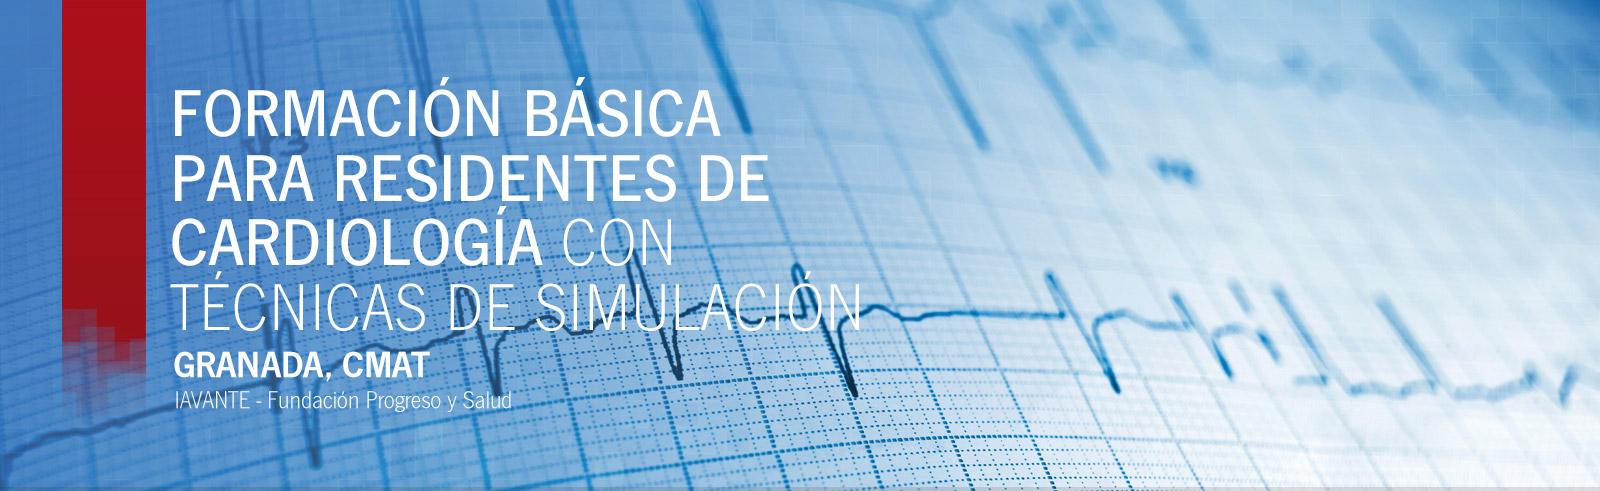 FORMACIÓN BÁSICA PARA RESIDENTES DE CARDIOLOGÍA CON TÉCNICAS DE SIMULACIÓN